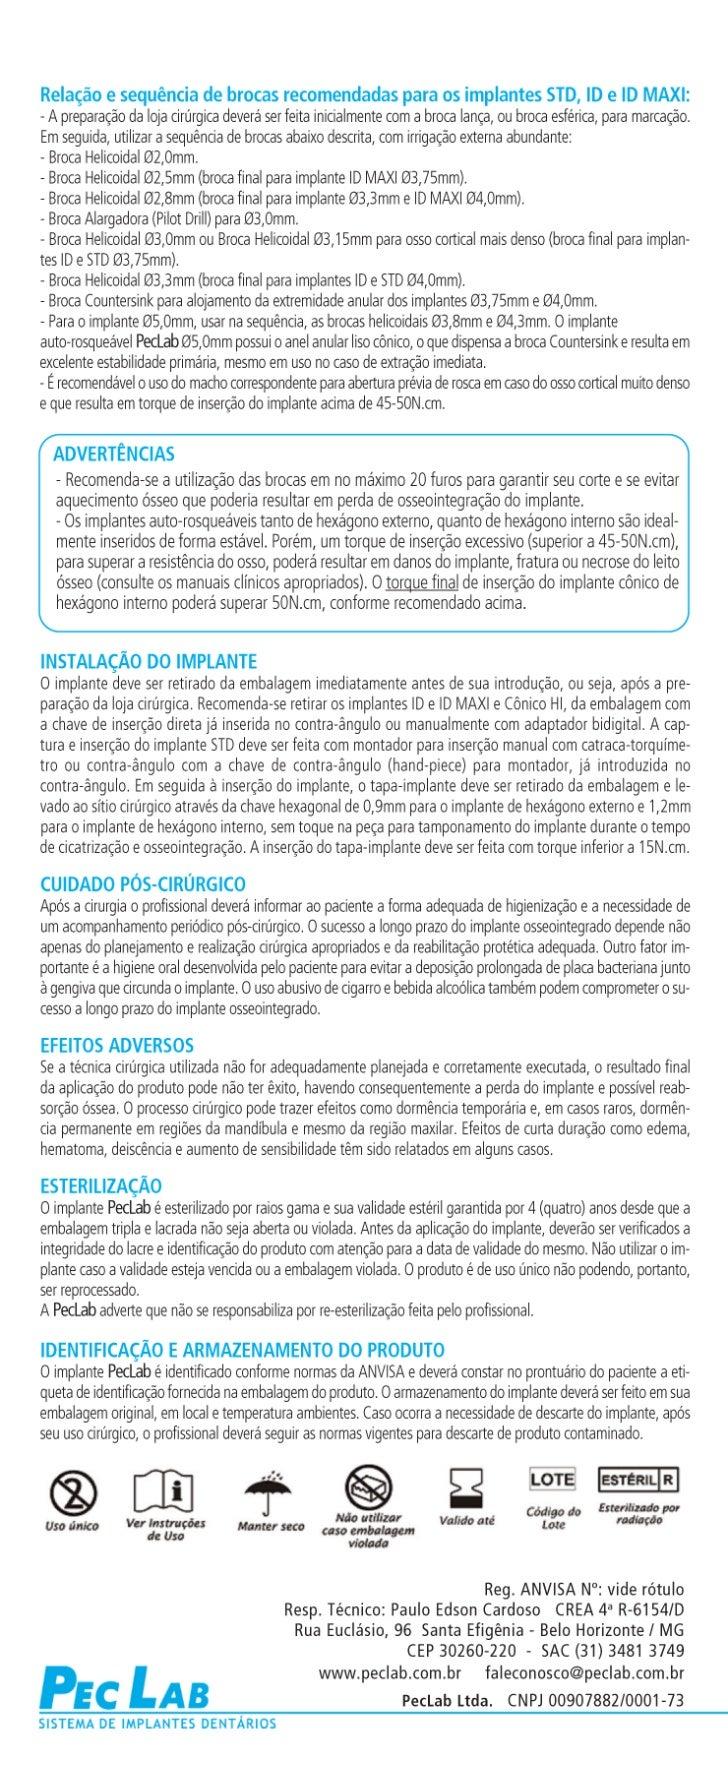 Implantes Autorosqueaveis Id e Standard pag 2